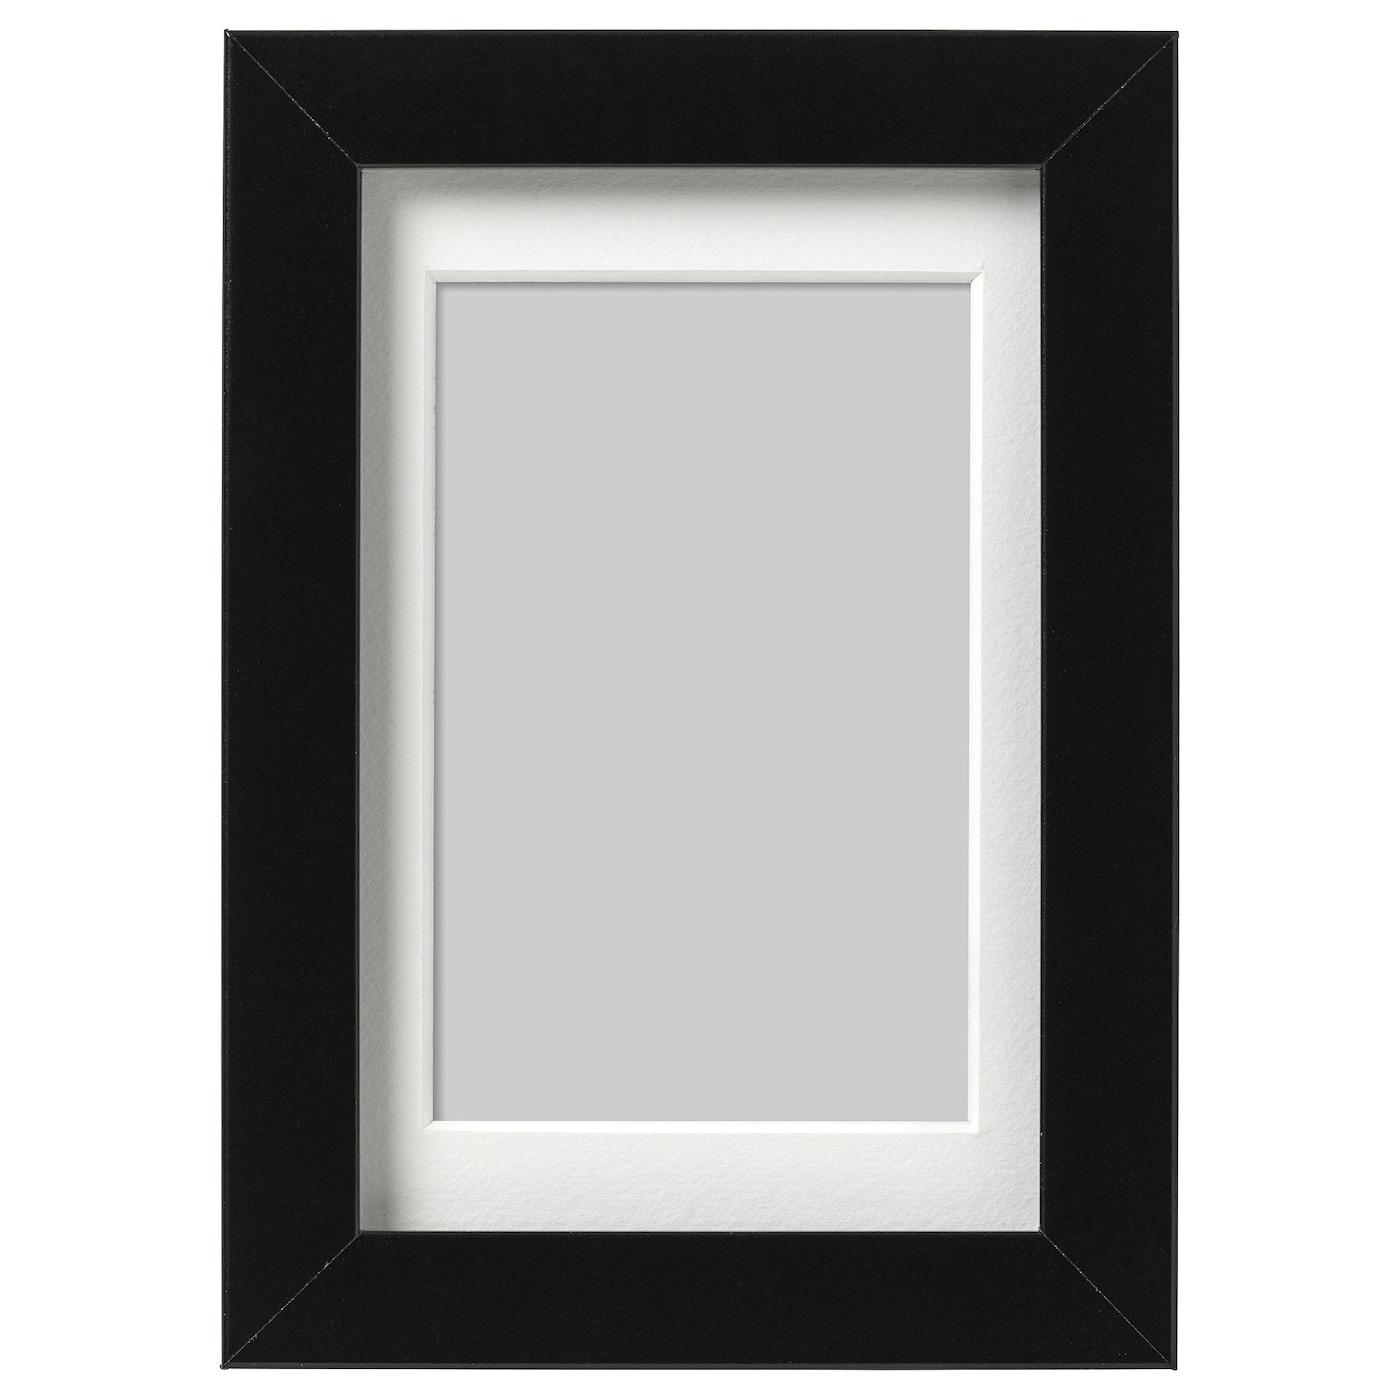 RIBBA Marco Negro 10 x 15 cm - IKEA